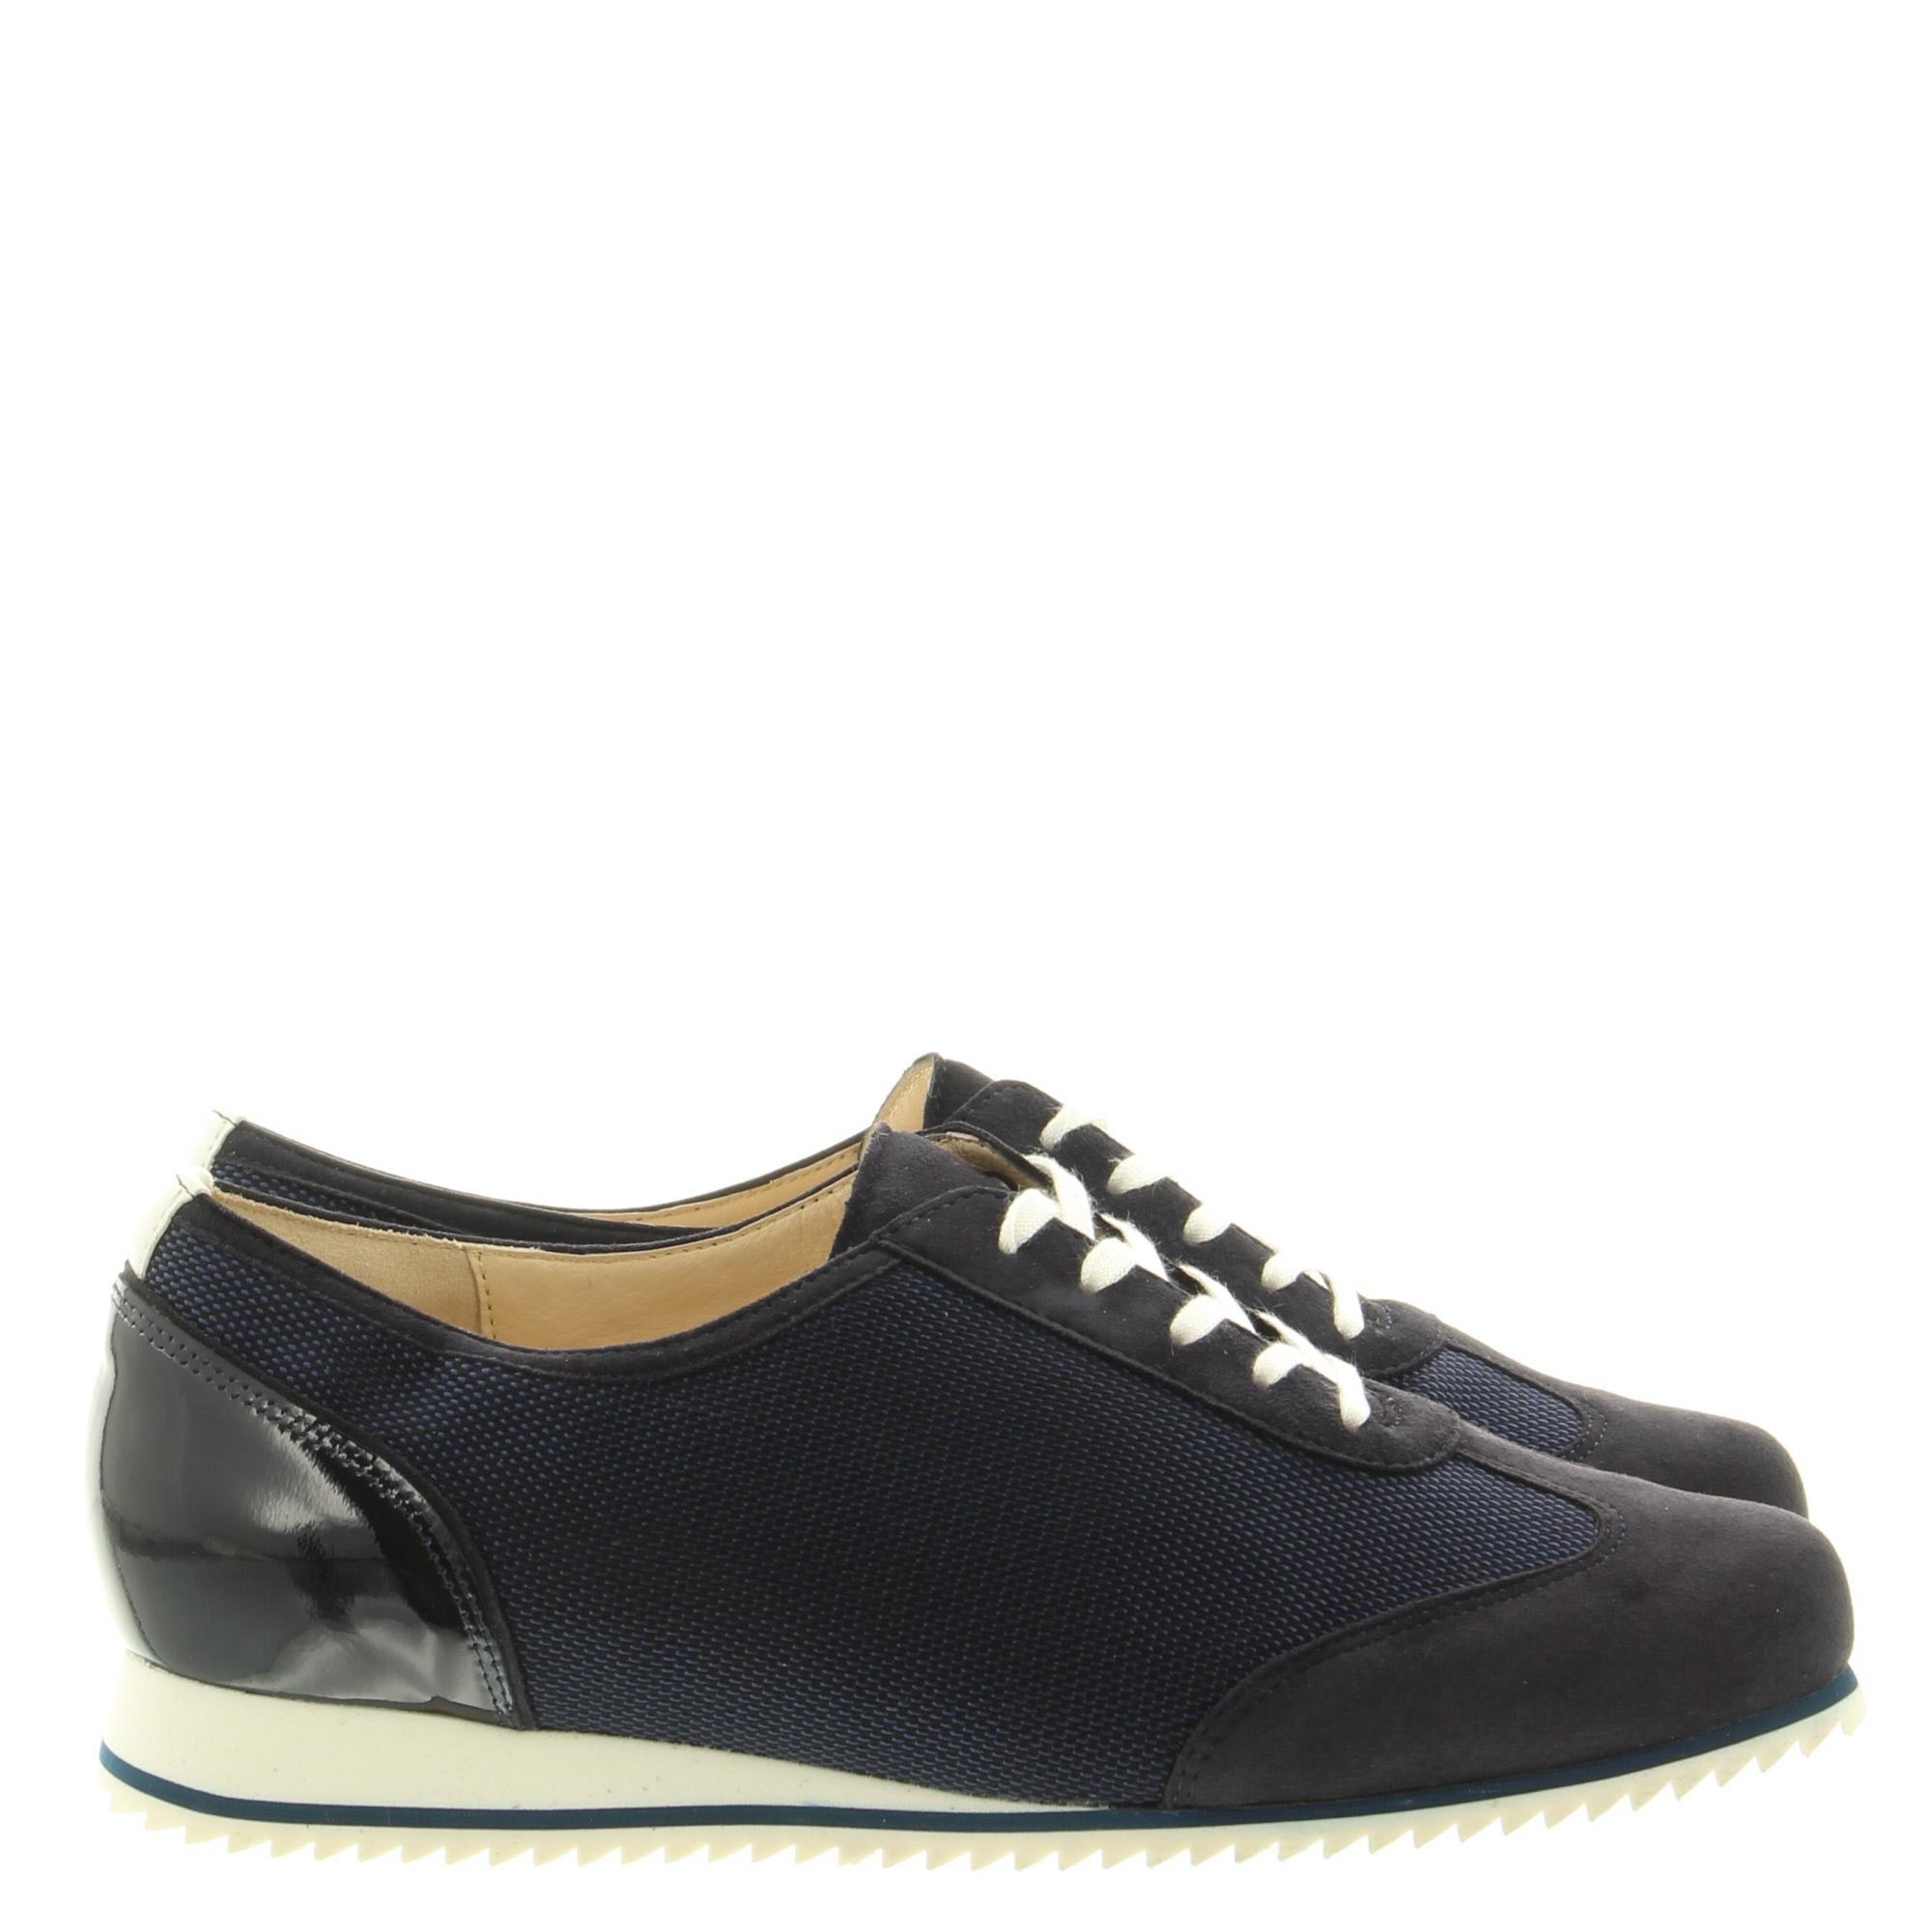 Hassia Shoes 301658 Piacenza 3000 Ocean